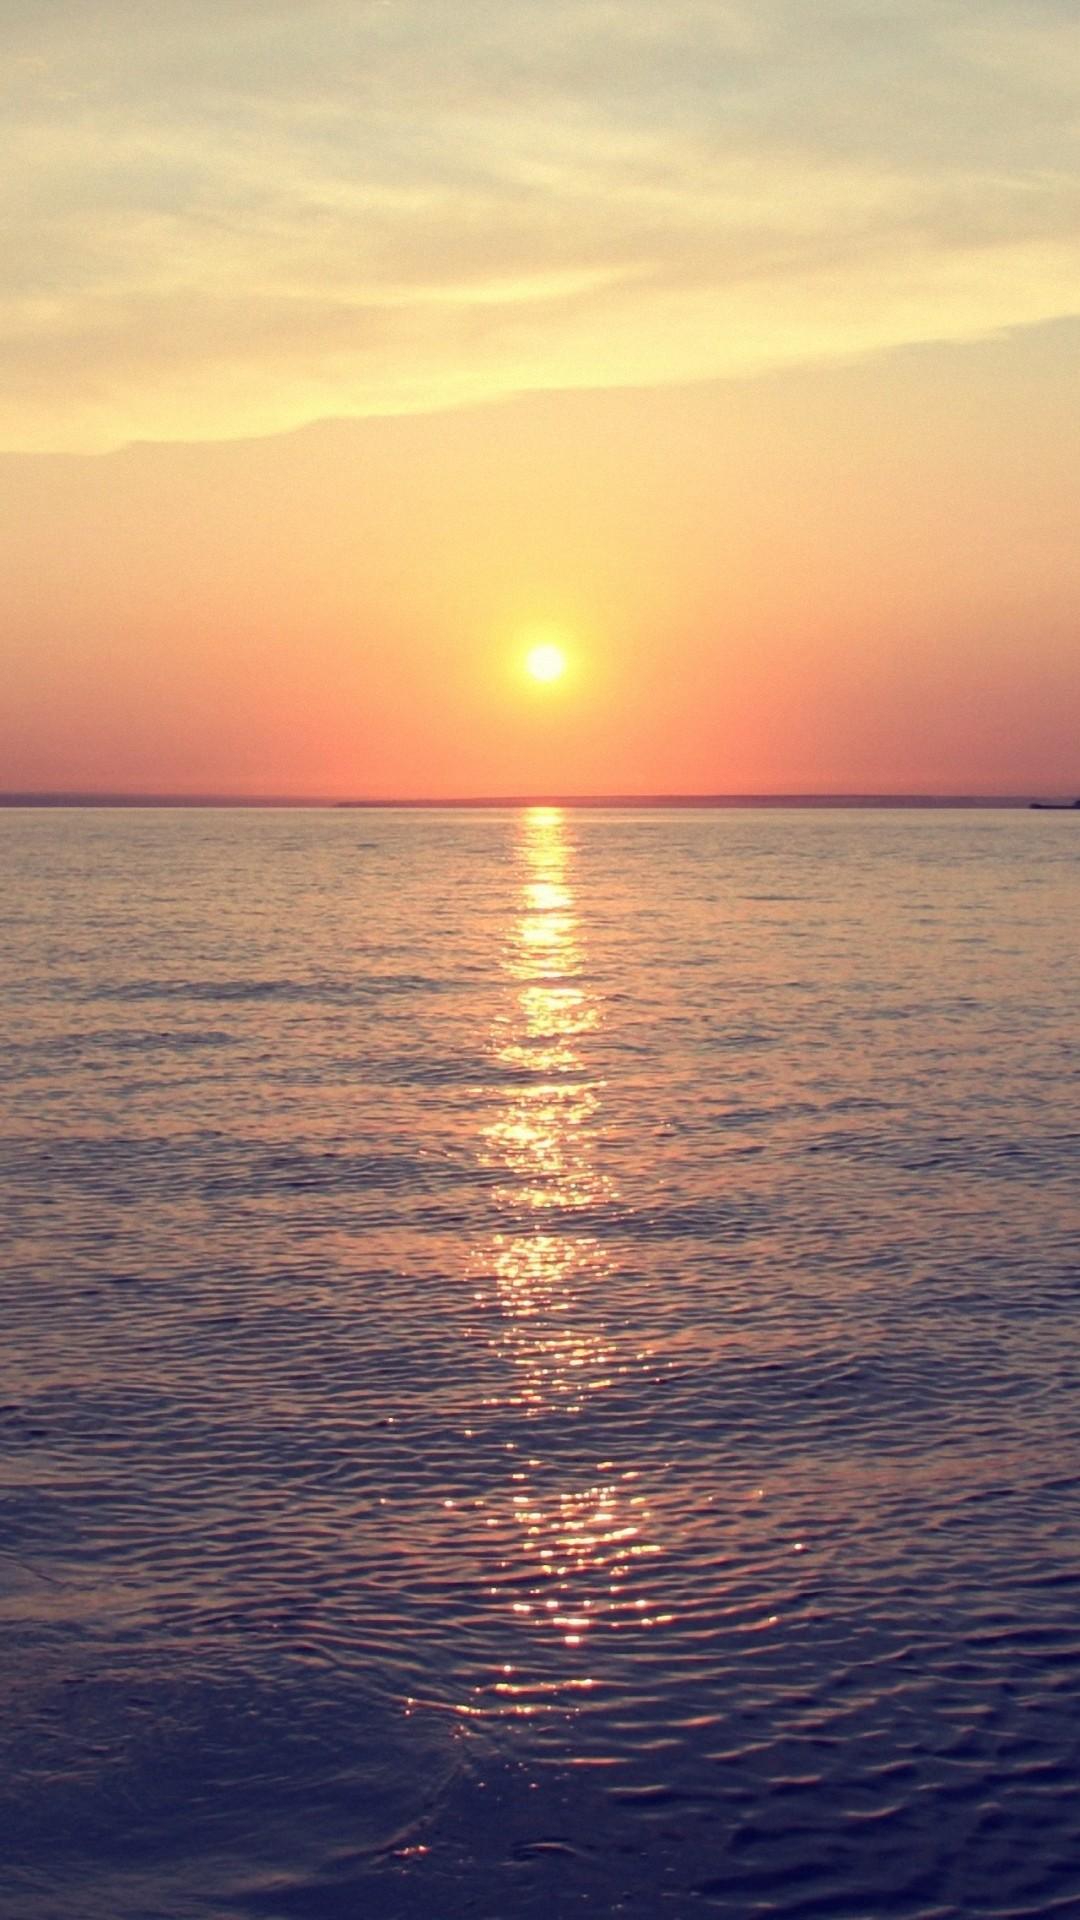 1080x1920, Hd Sea Sunrise Samsung Galaxy S4 S5 Wallpapers - Hd Sea - HD Wallpaper